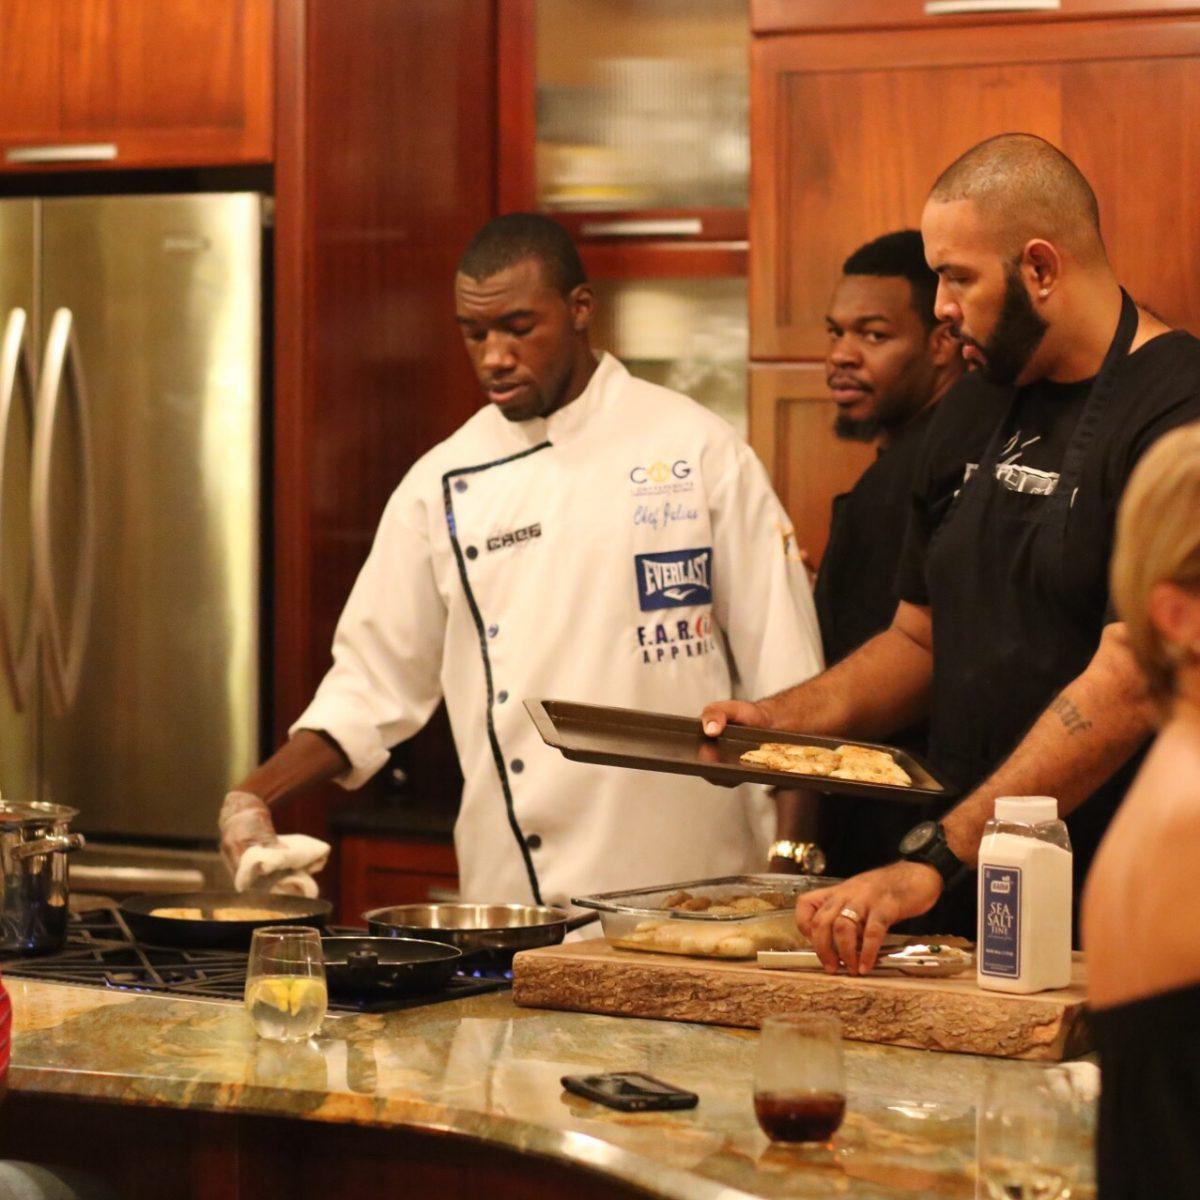 Caribbean chef and boxer Julius Jackson in St. Croix